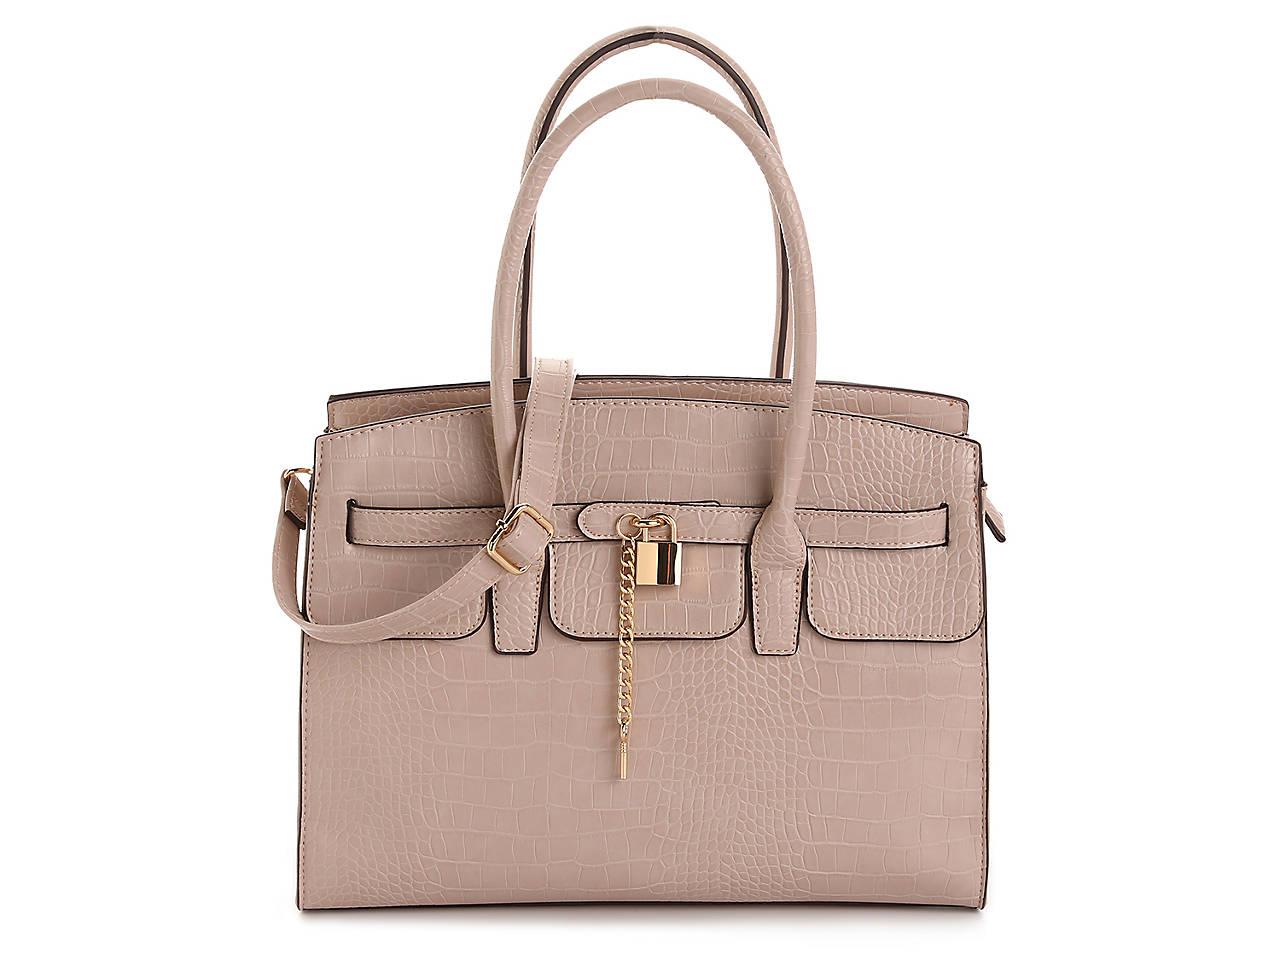 d80f1deb50b Aldo Guice Satchel Women s Handbags   Accessories